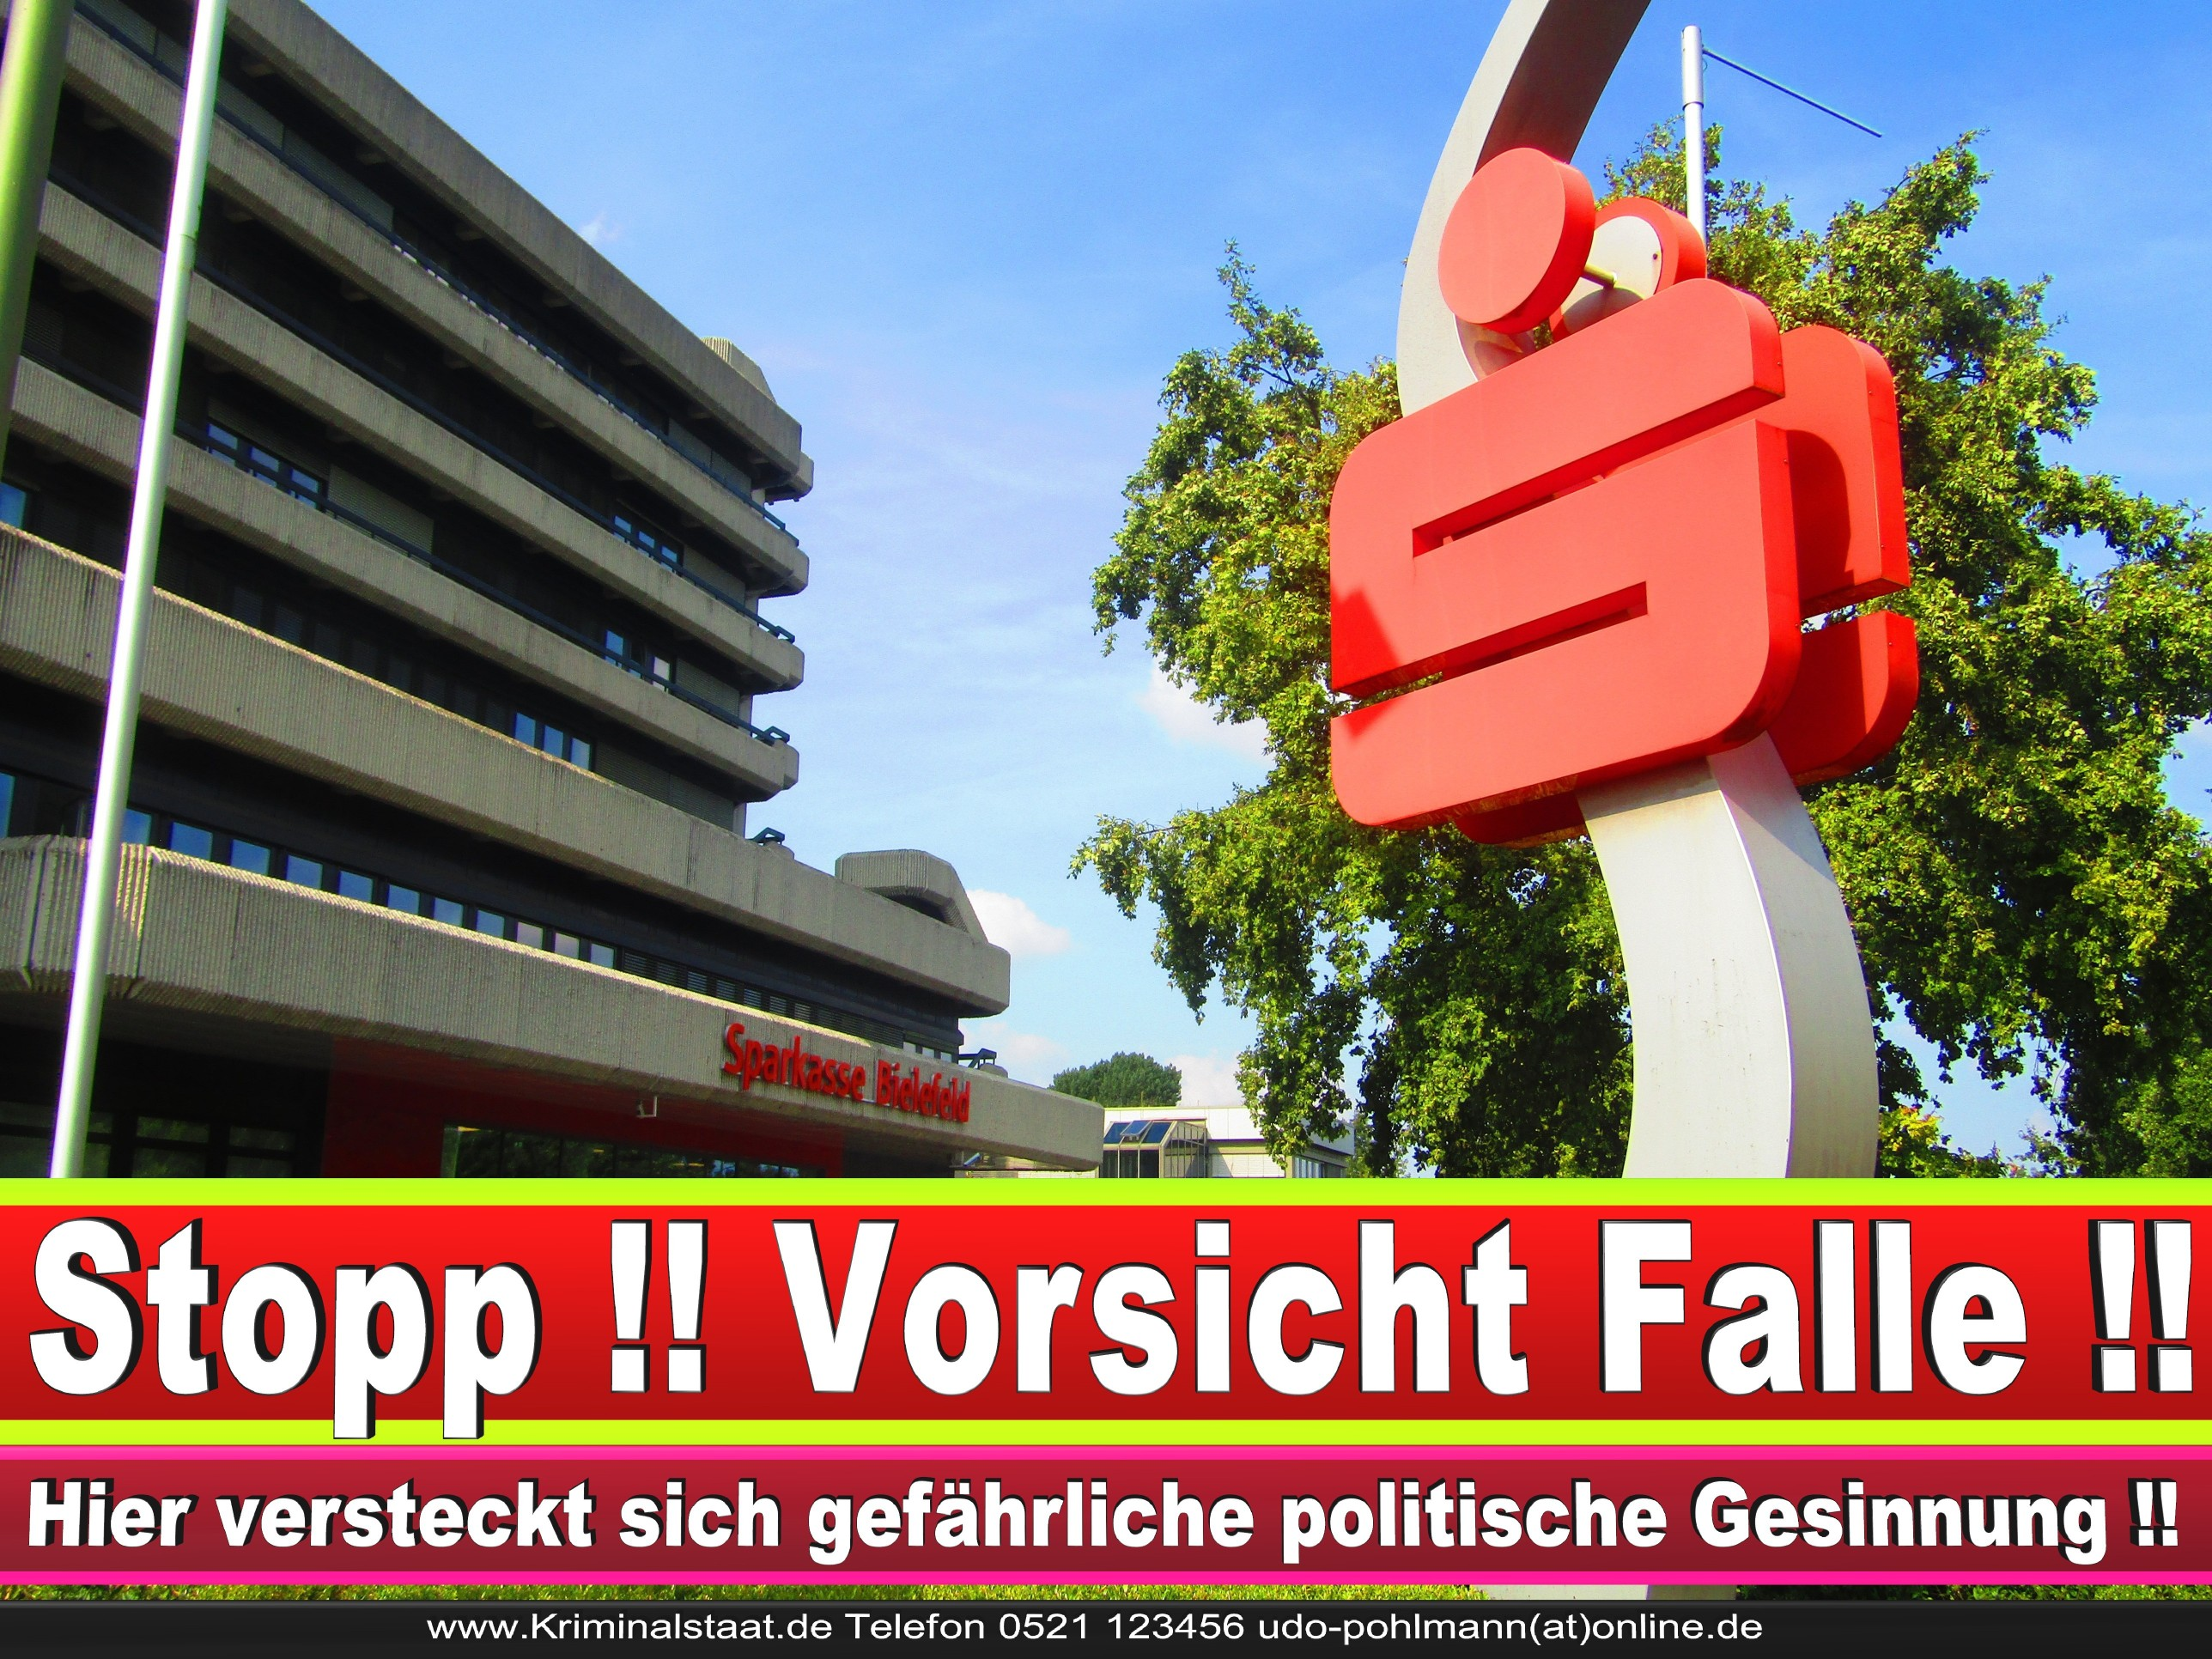 SPARKASSE BIELEFELD ANDREAS RÜTHER CDU BIELEFELD 5 LANDTAGSWAHL BUNDESTAGSWAHL BÜRGERMEISTERWAHL